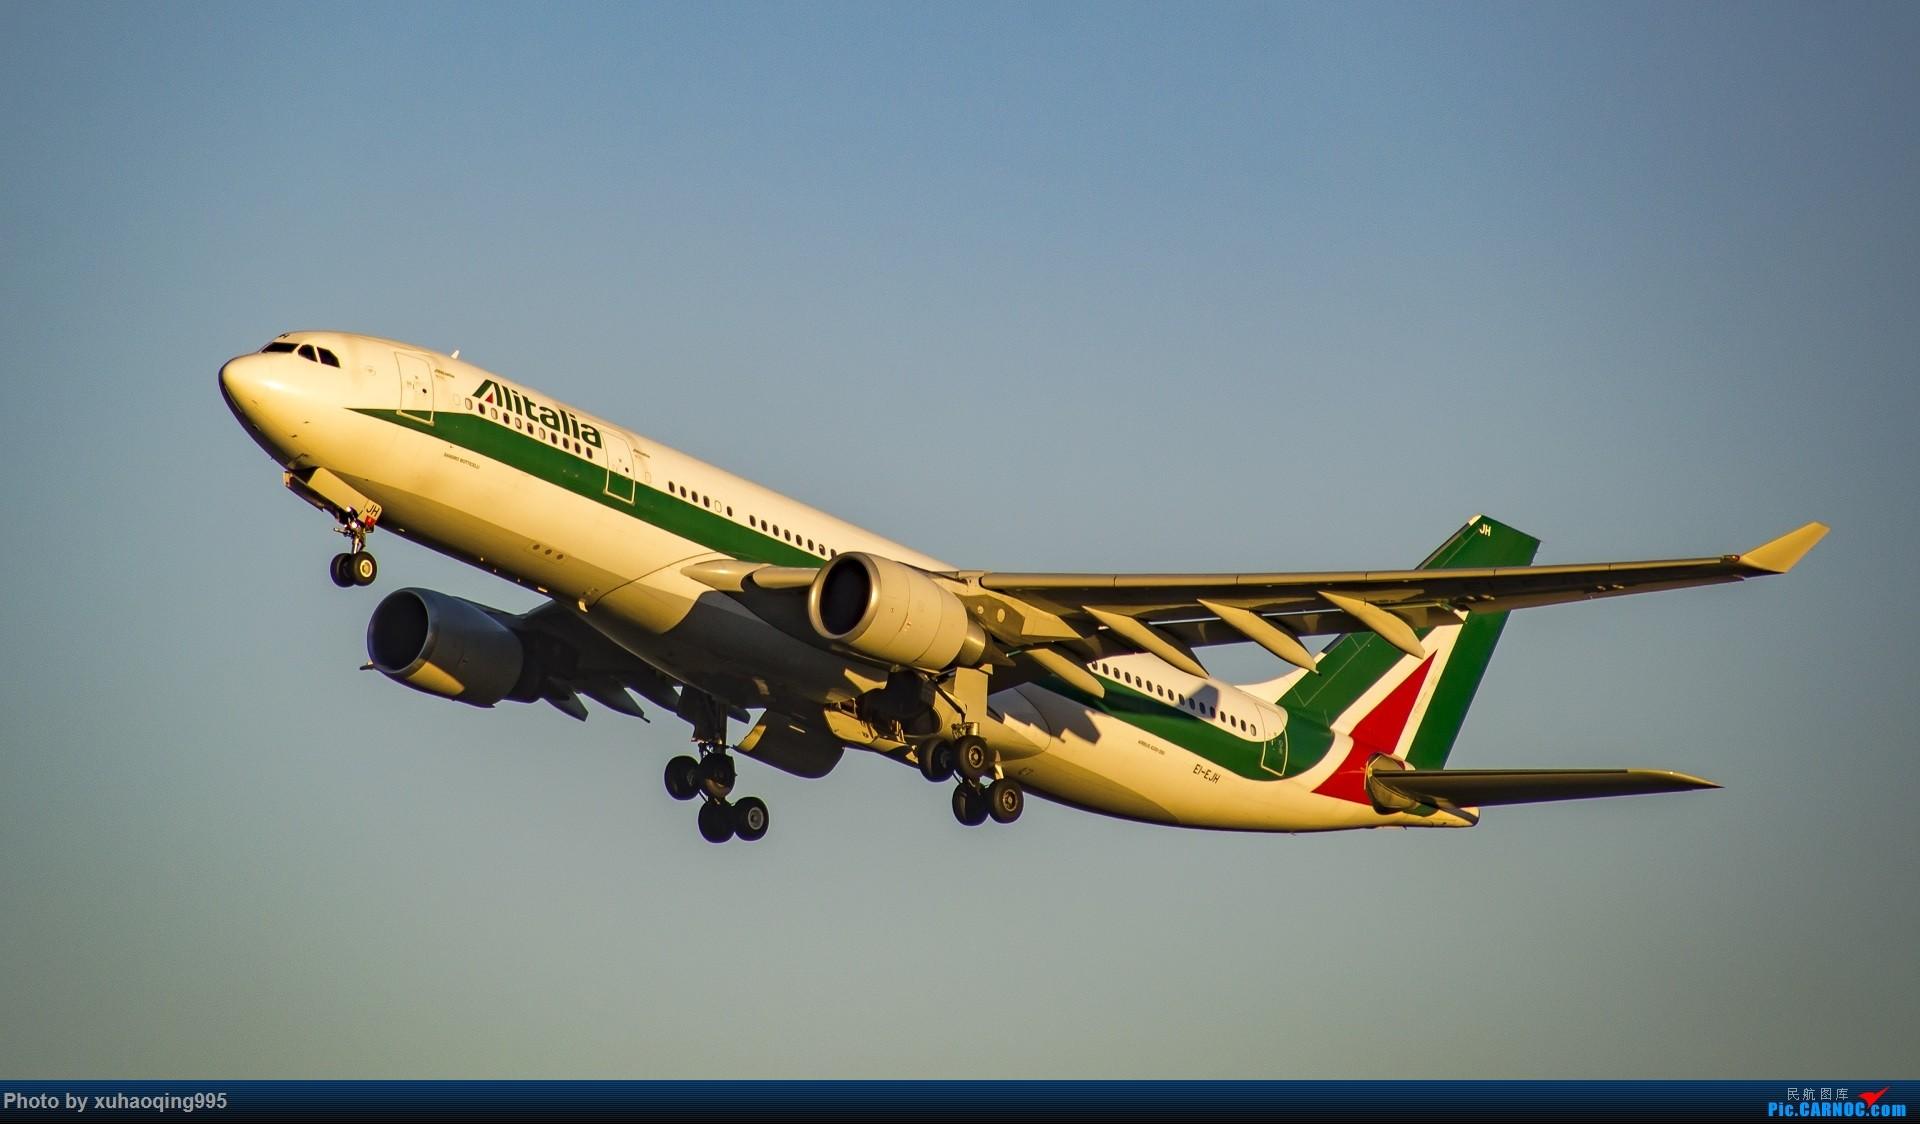 Re:[原创]罗马机场(FCO)拍机 AIRBUS A330-200 EI-EJH 意大利菲乌米奇诺机场